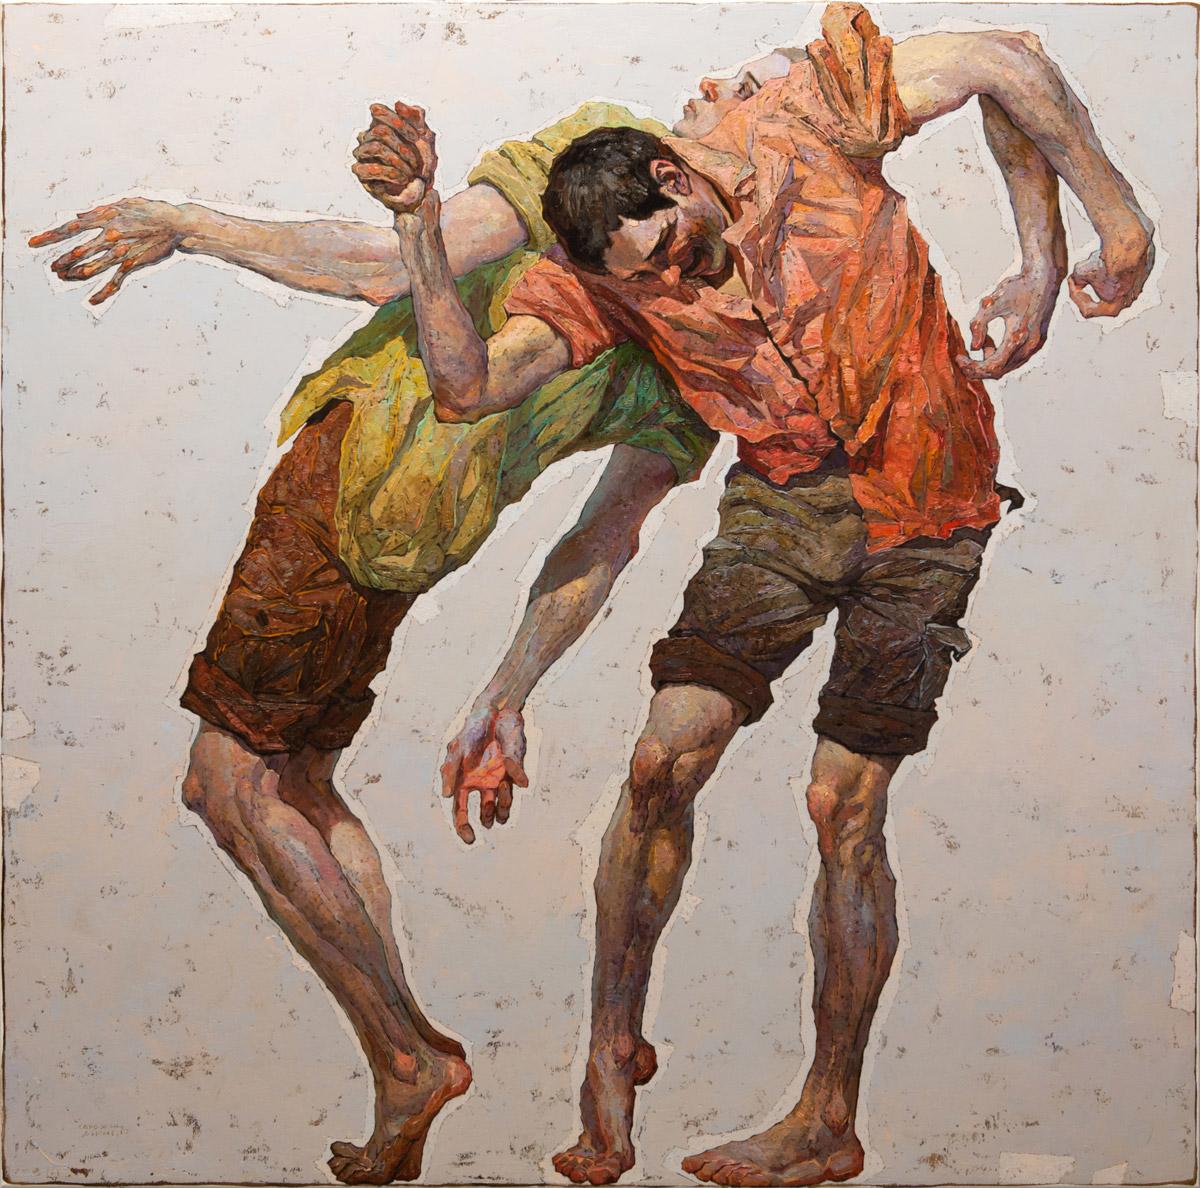 Human Figure Painting Artists